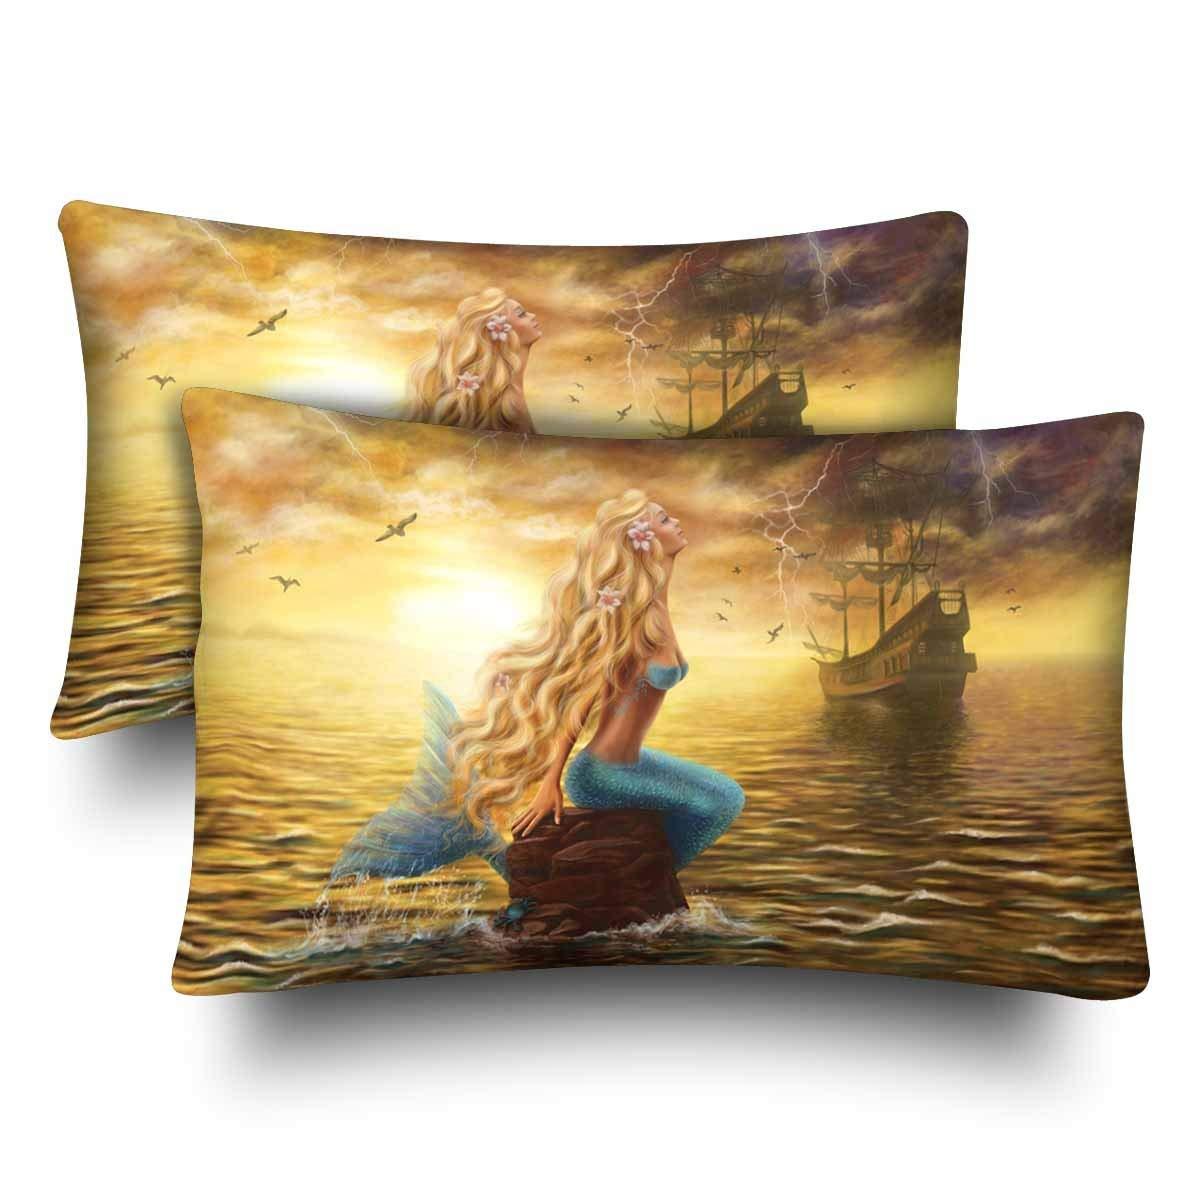 GCKG Beautiful Fish Princess Mermaid Boat Ocean Pillow Cases Pillowcase 20x30 inches Set of 2 - image 4 de 4